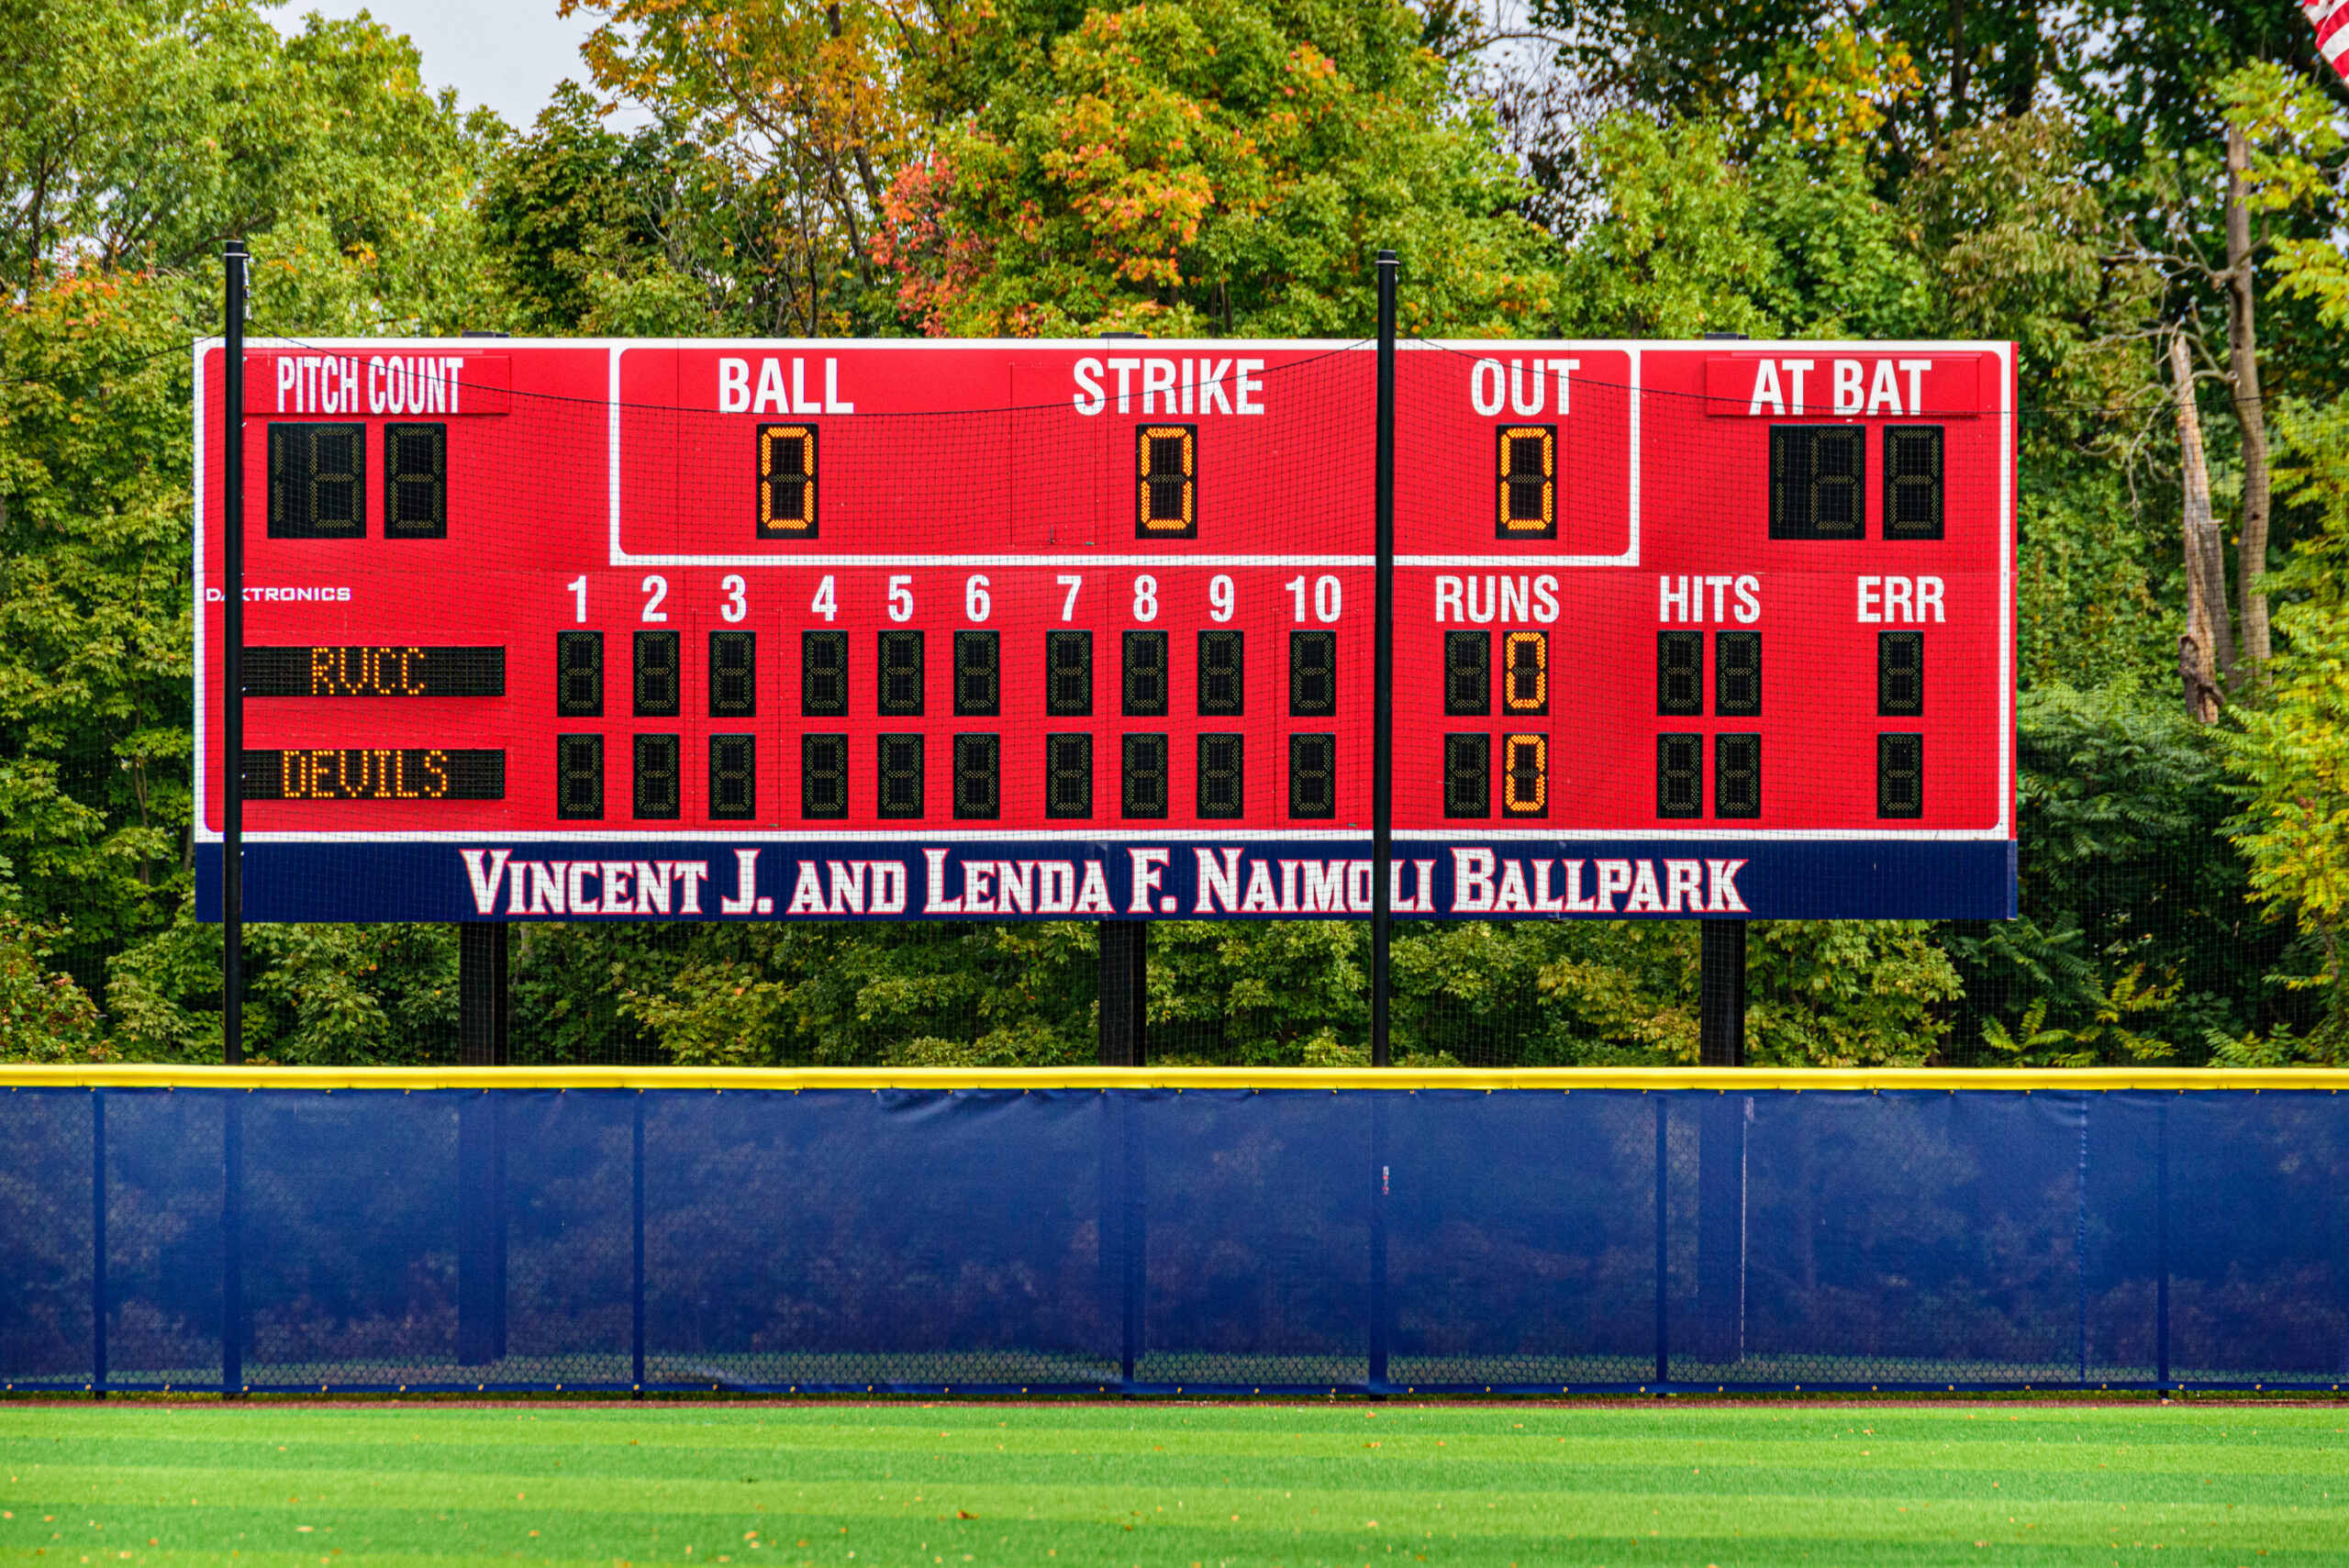 The scoreboard at the Vincent J. and Lenda F. Naimoli Ballpark.